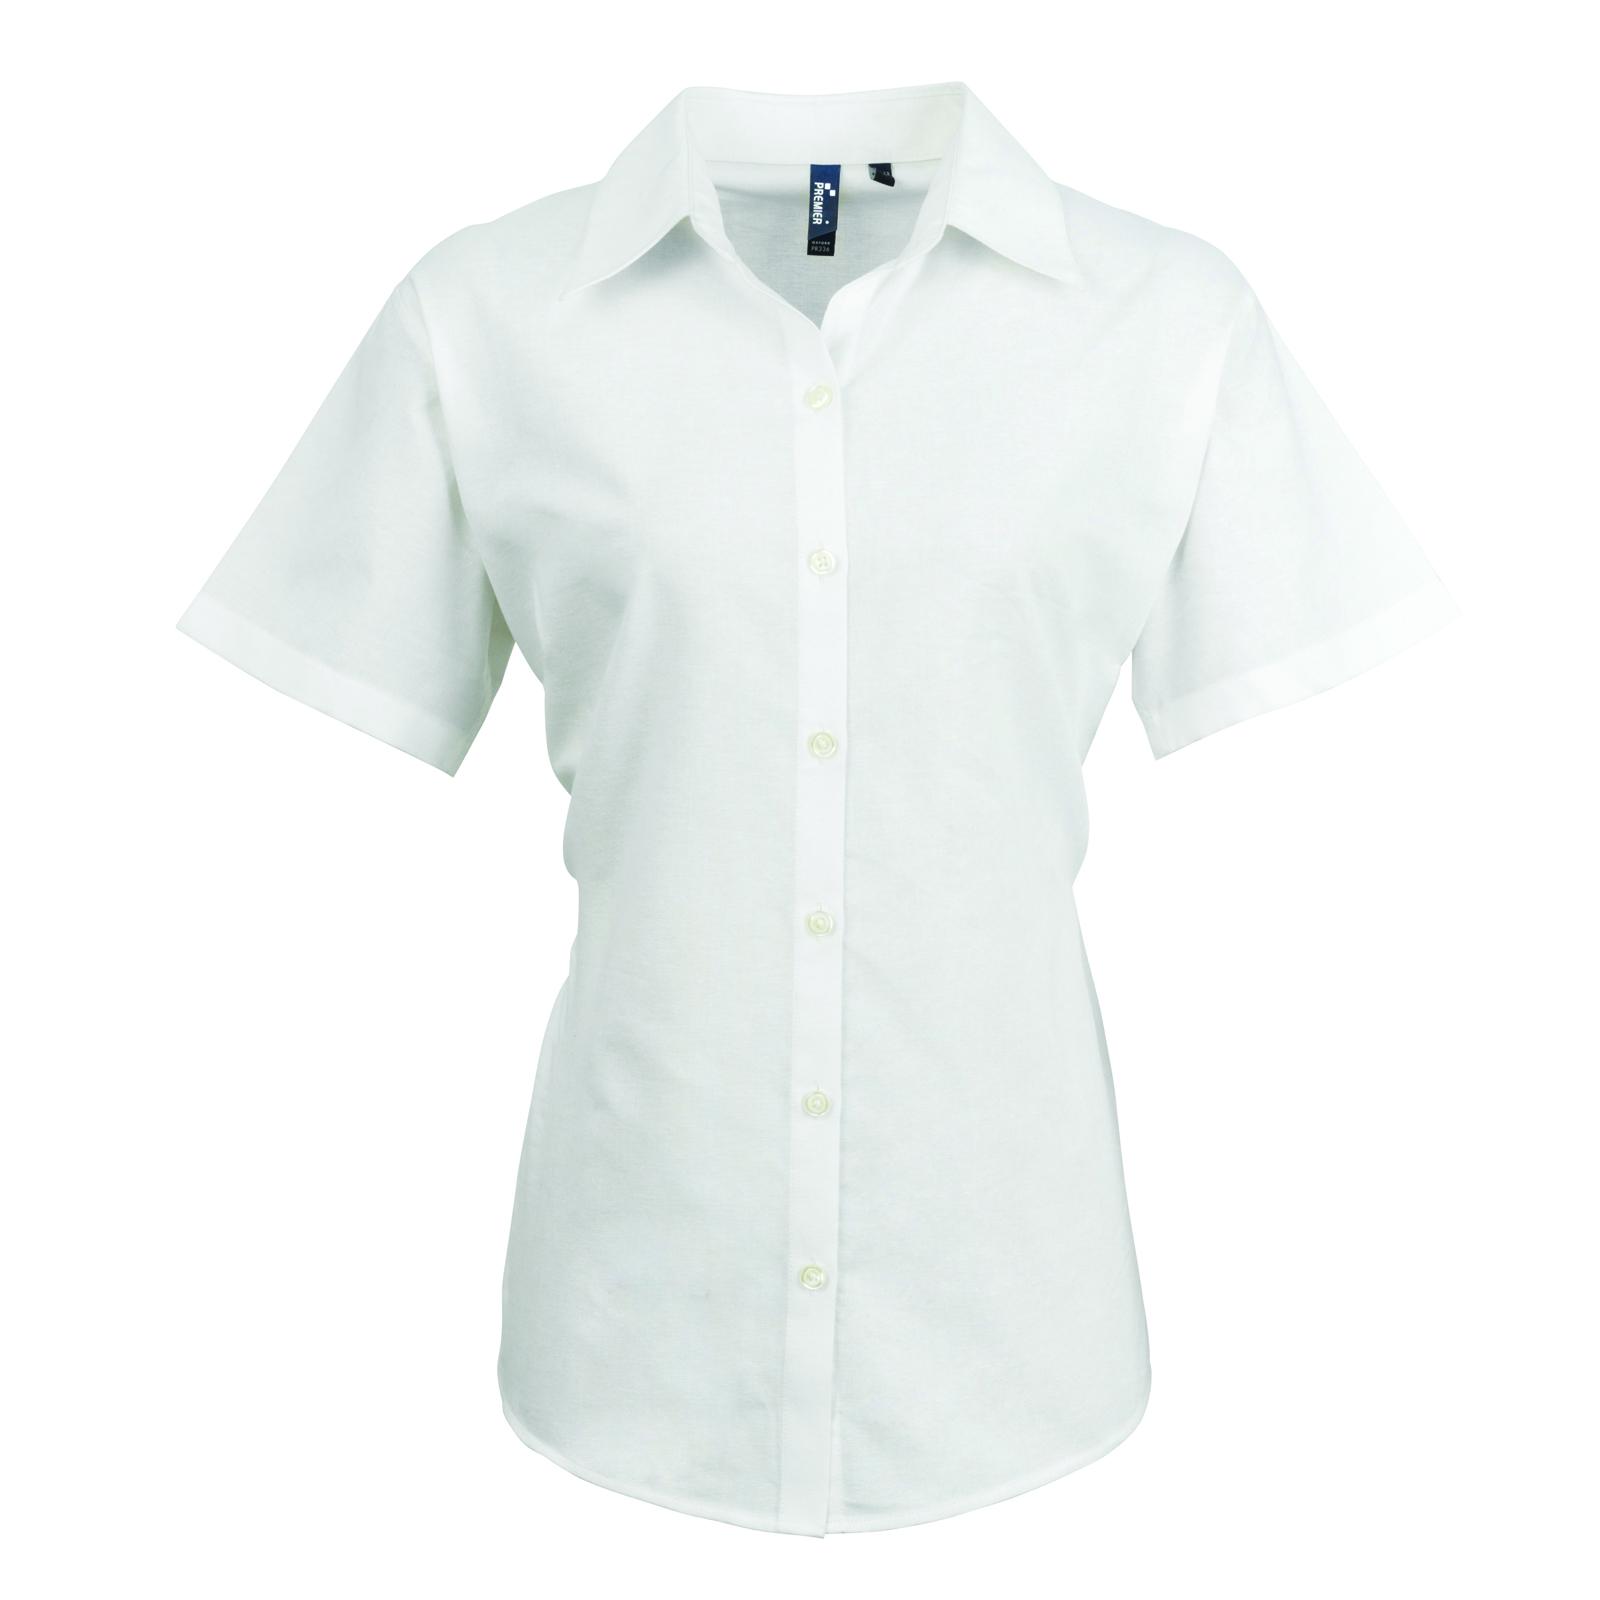 86bdb13d06c New Premier Womens Smart Oxford Ladies Short Sleeve Collared Shirt ...